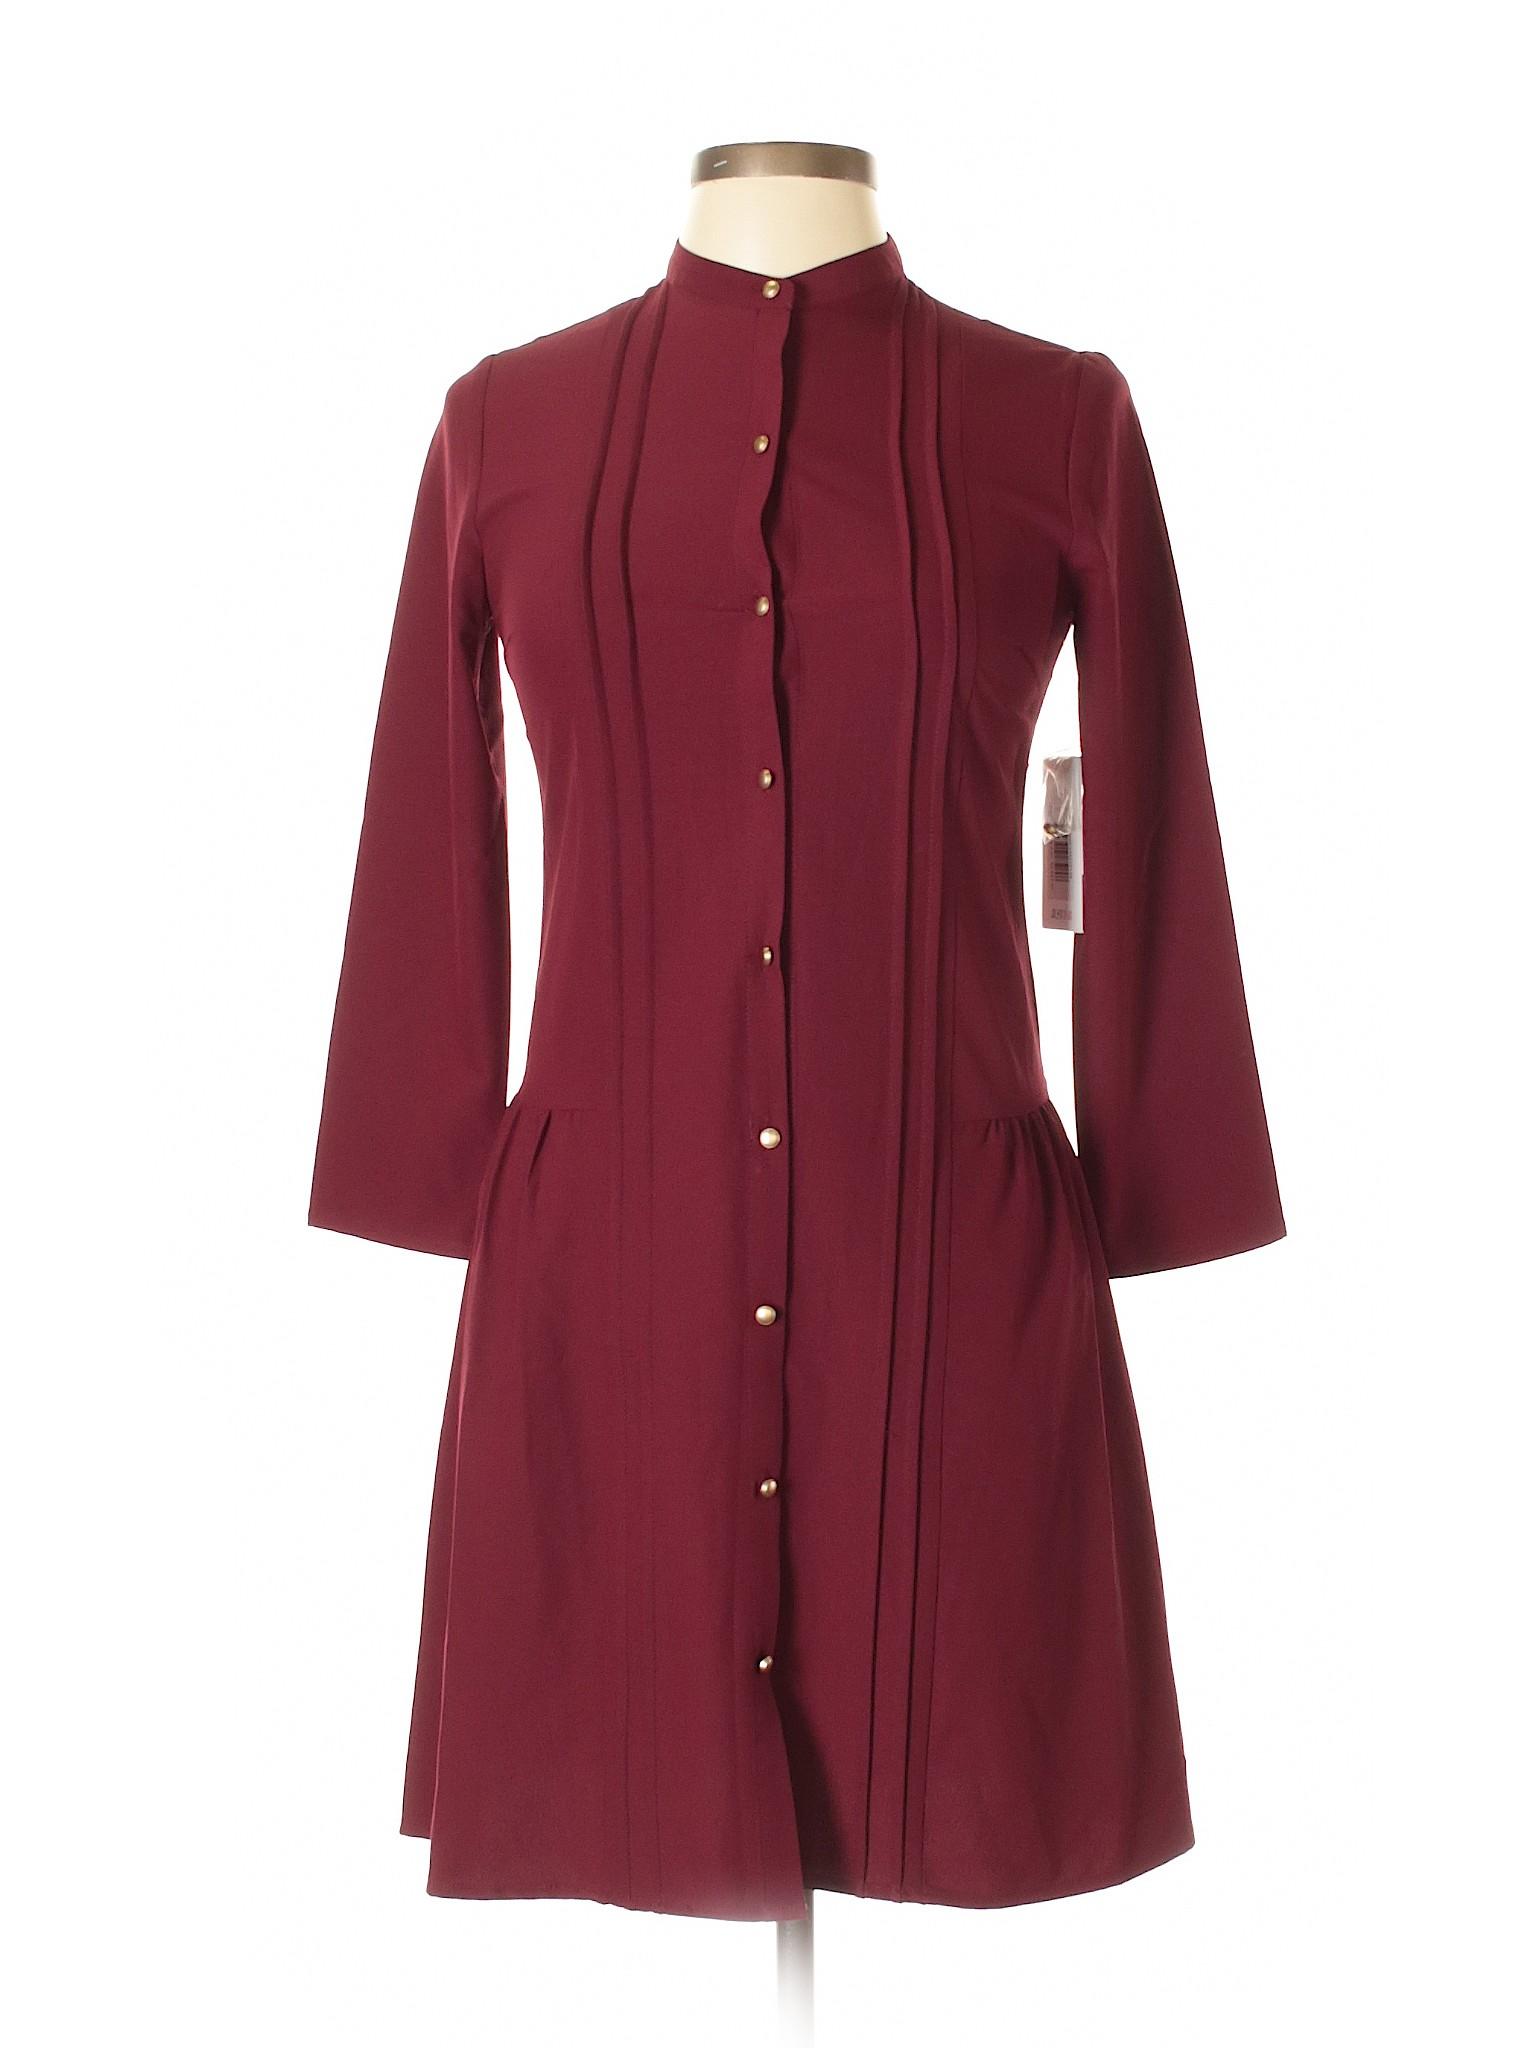 Dress Just Casual Winter Fab Boutique ZIqST